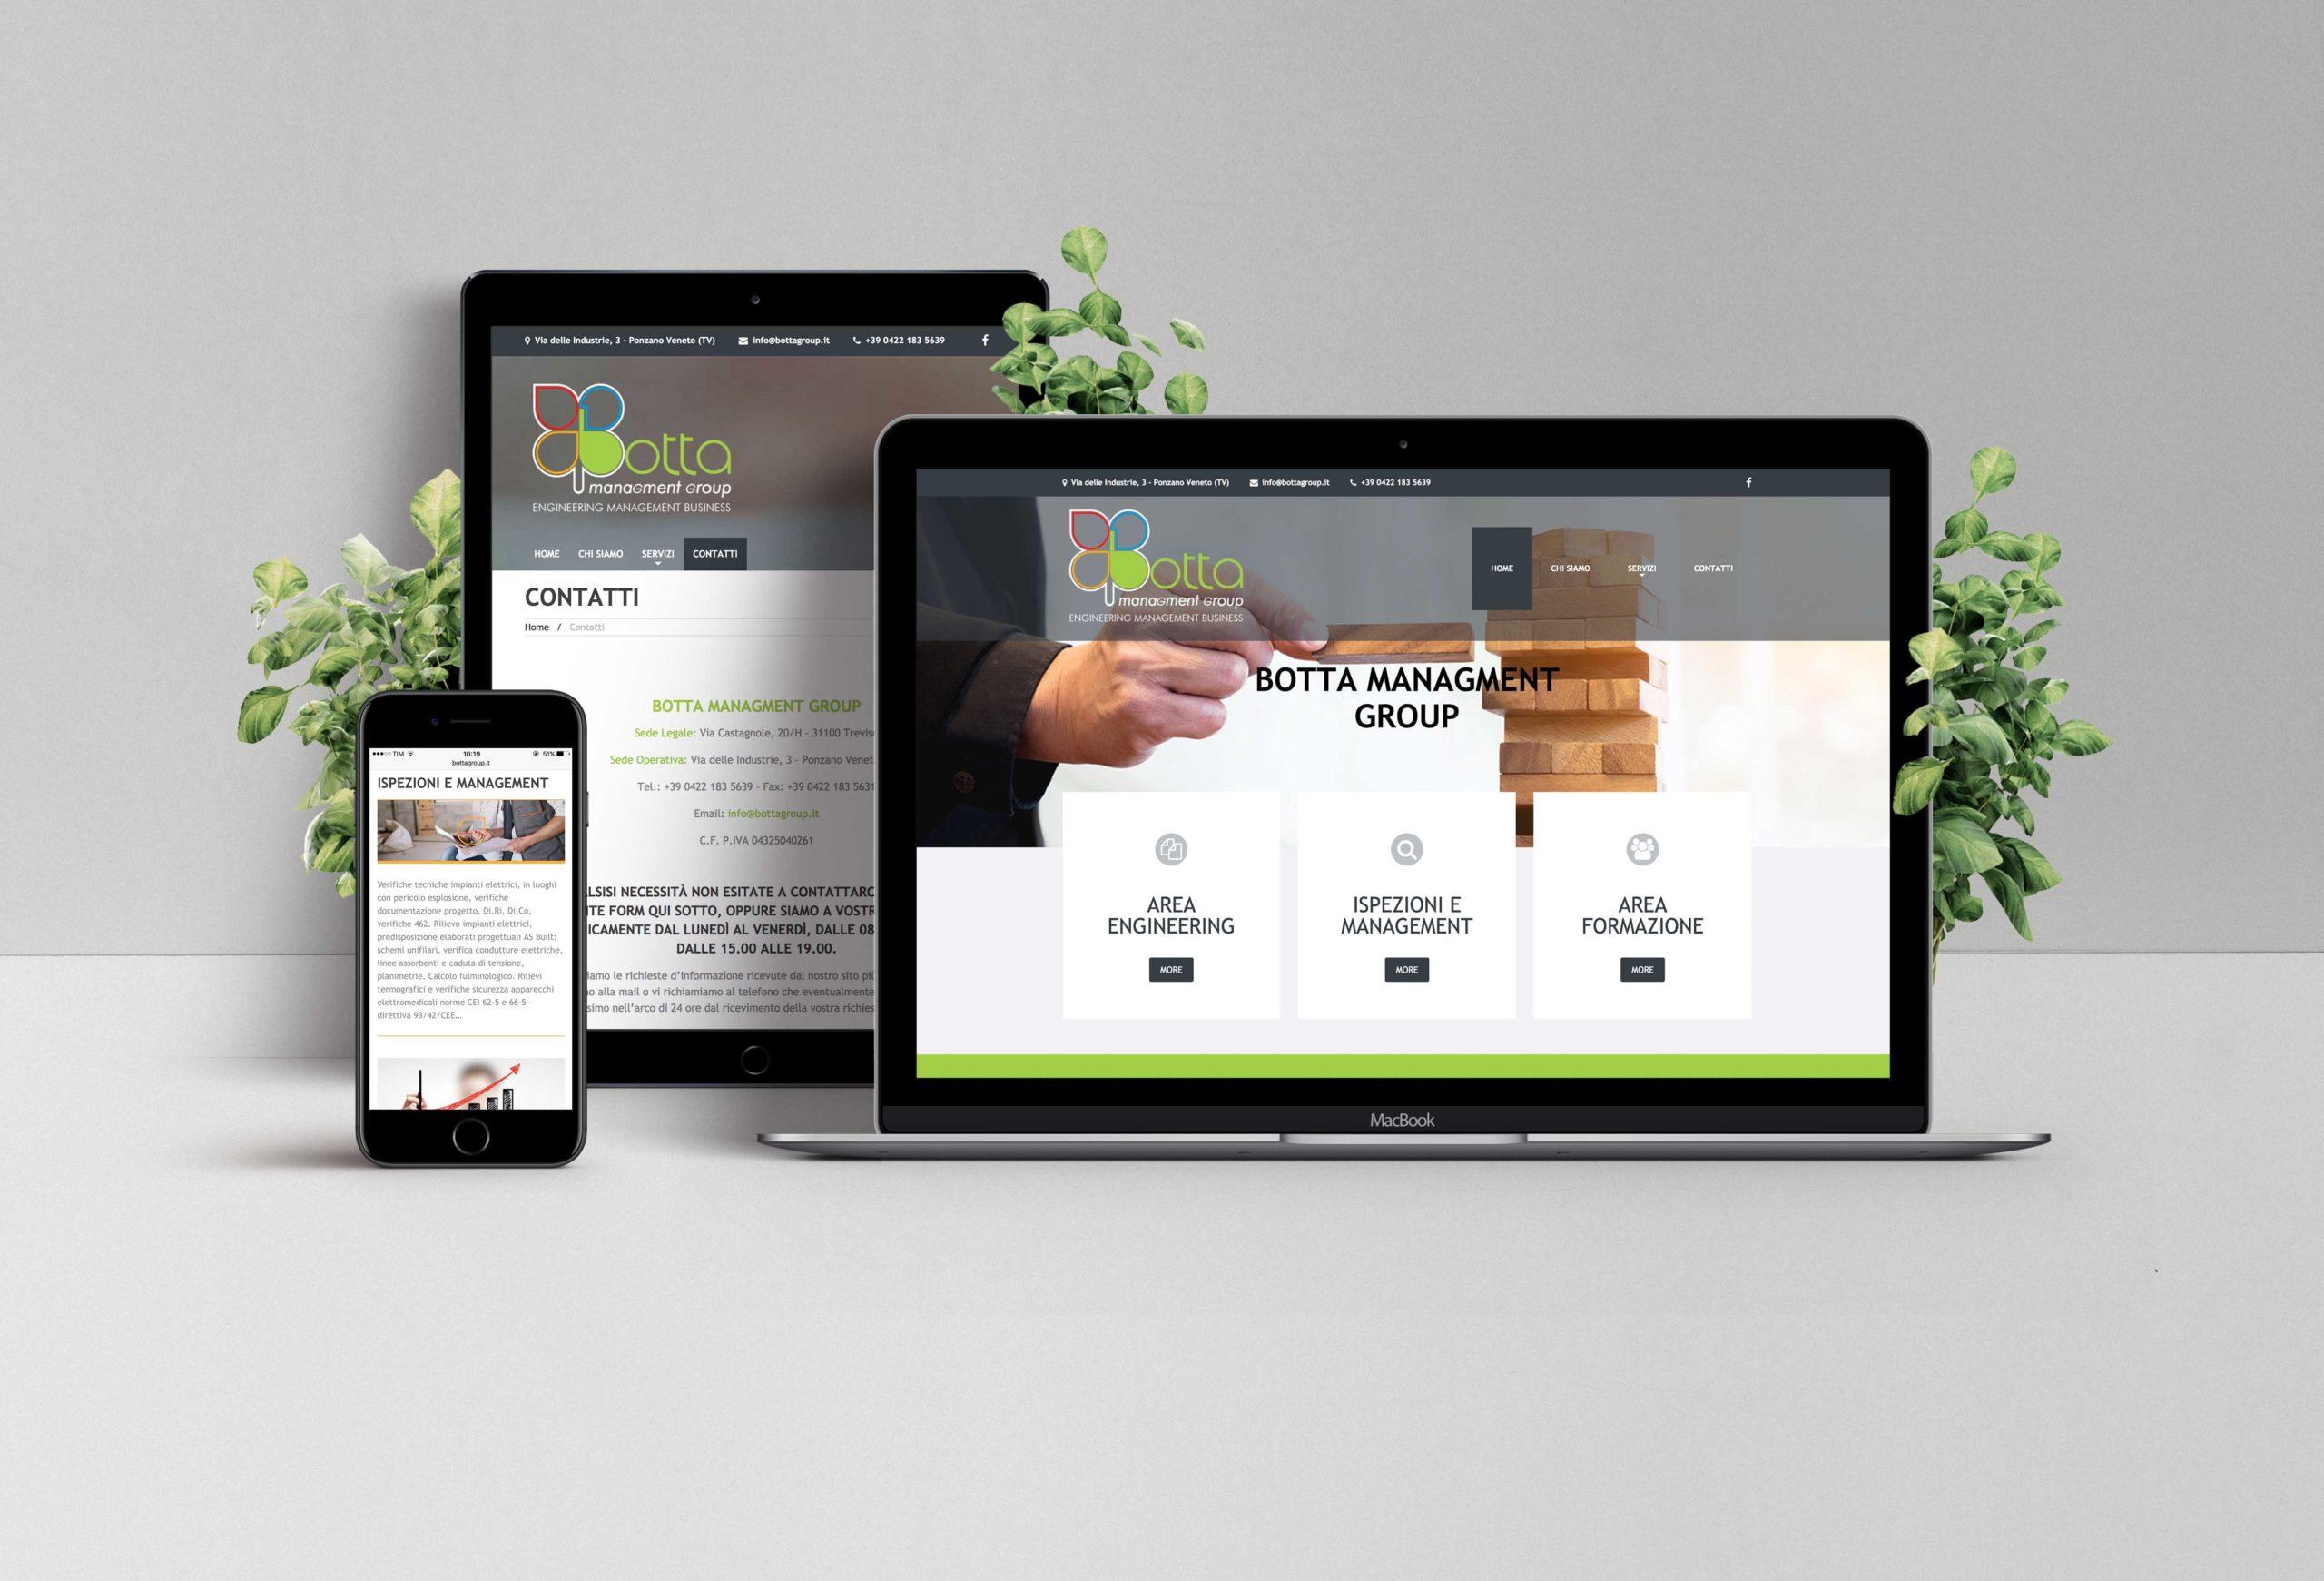 botta group web site